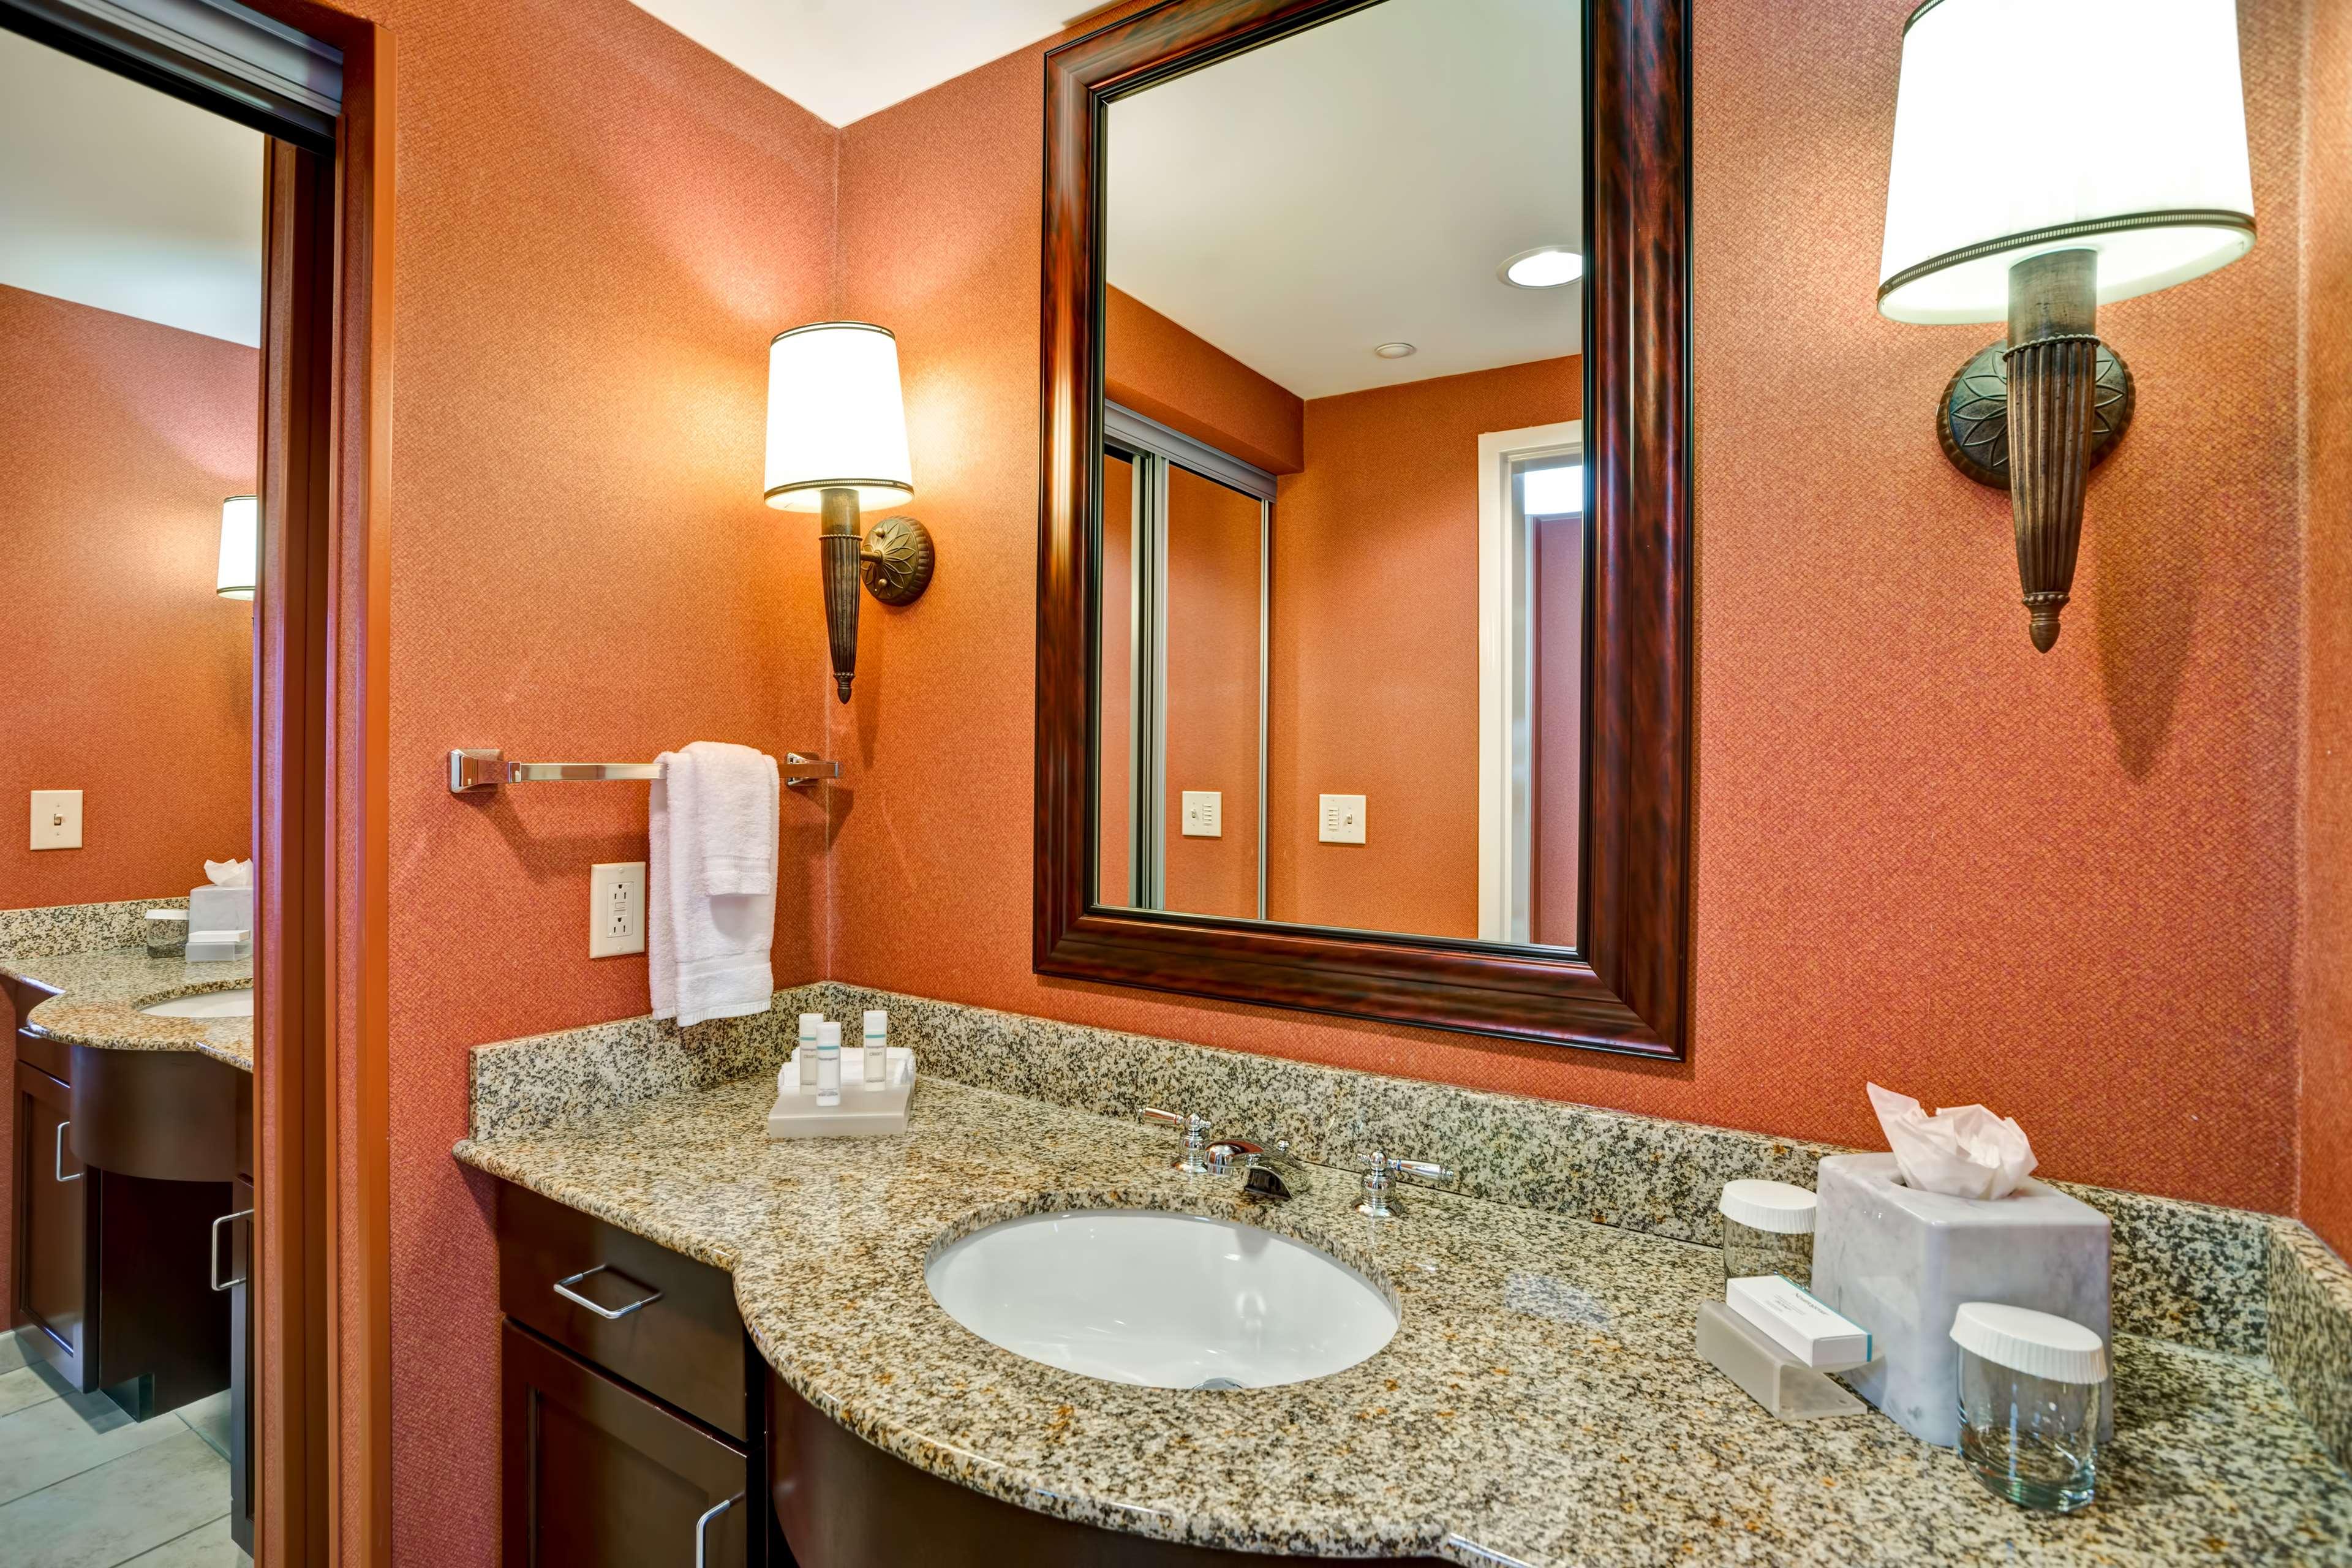 Homewood Suites by Hilton Fredericksburg image 37